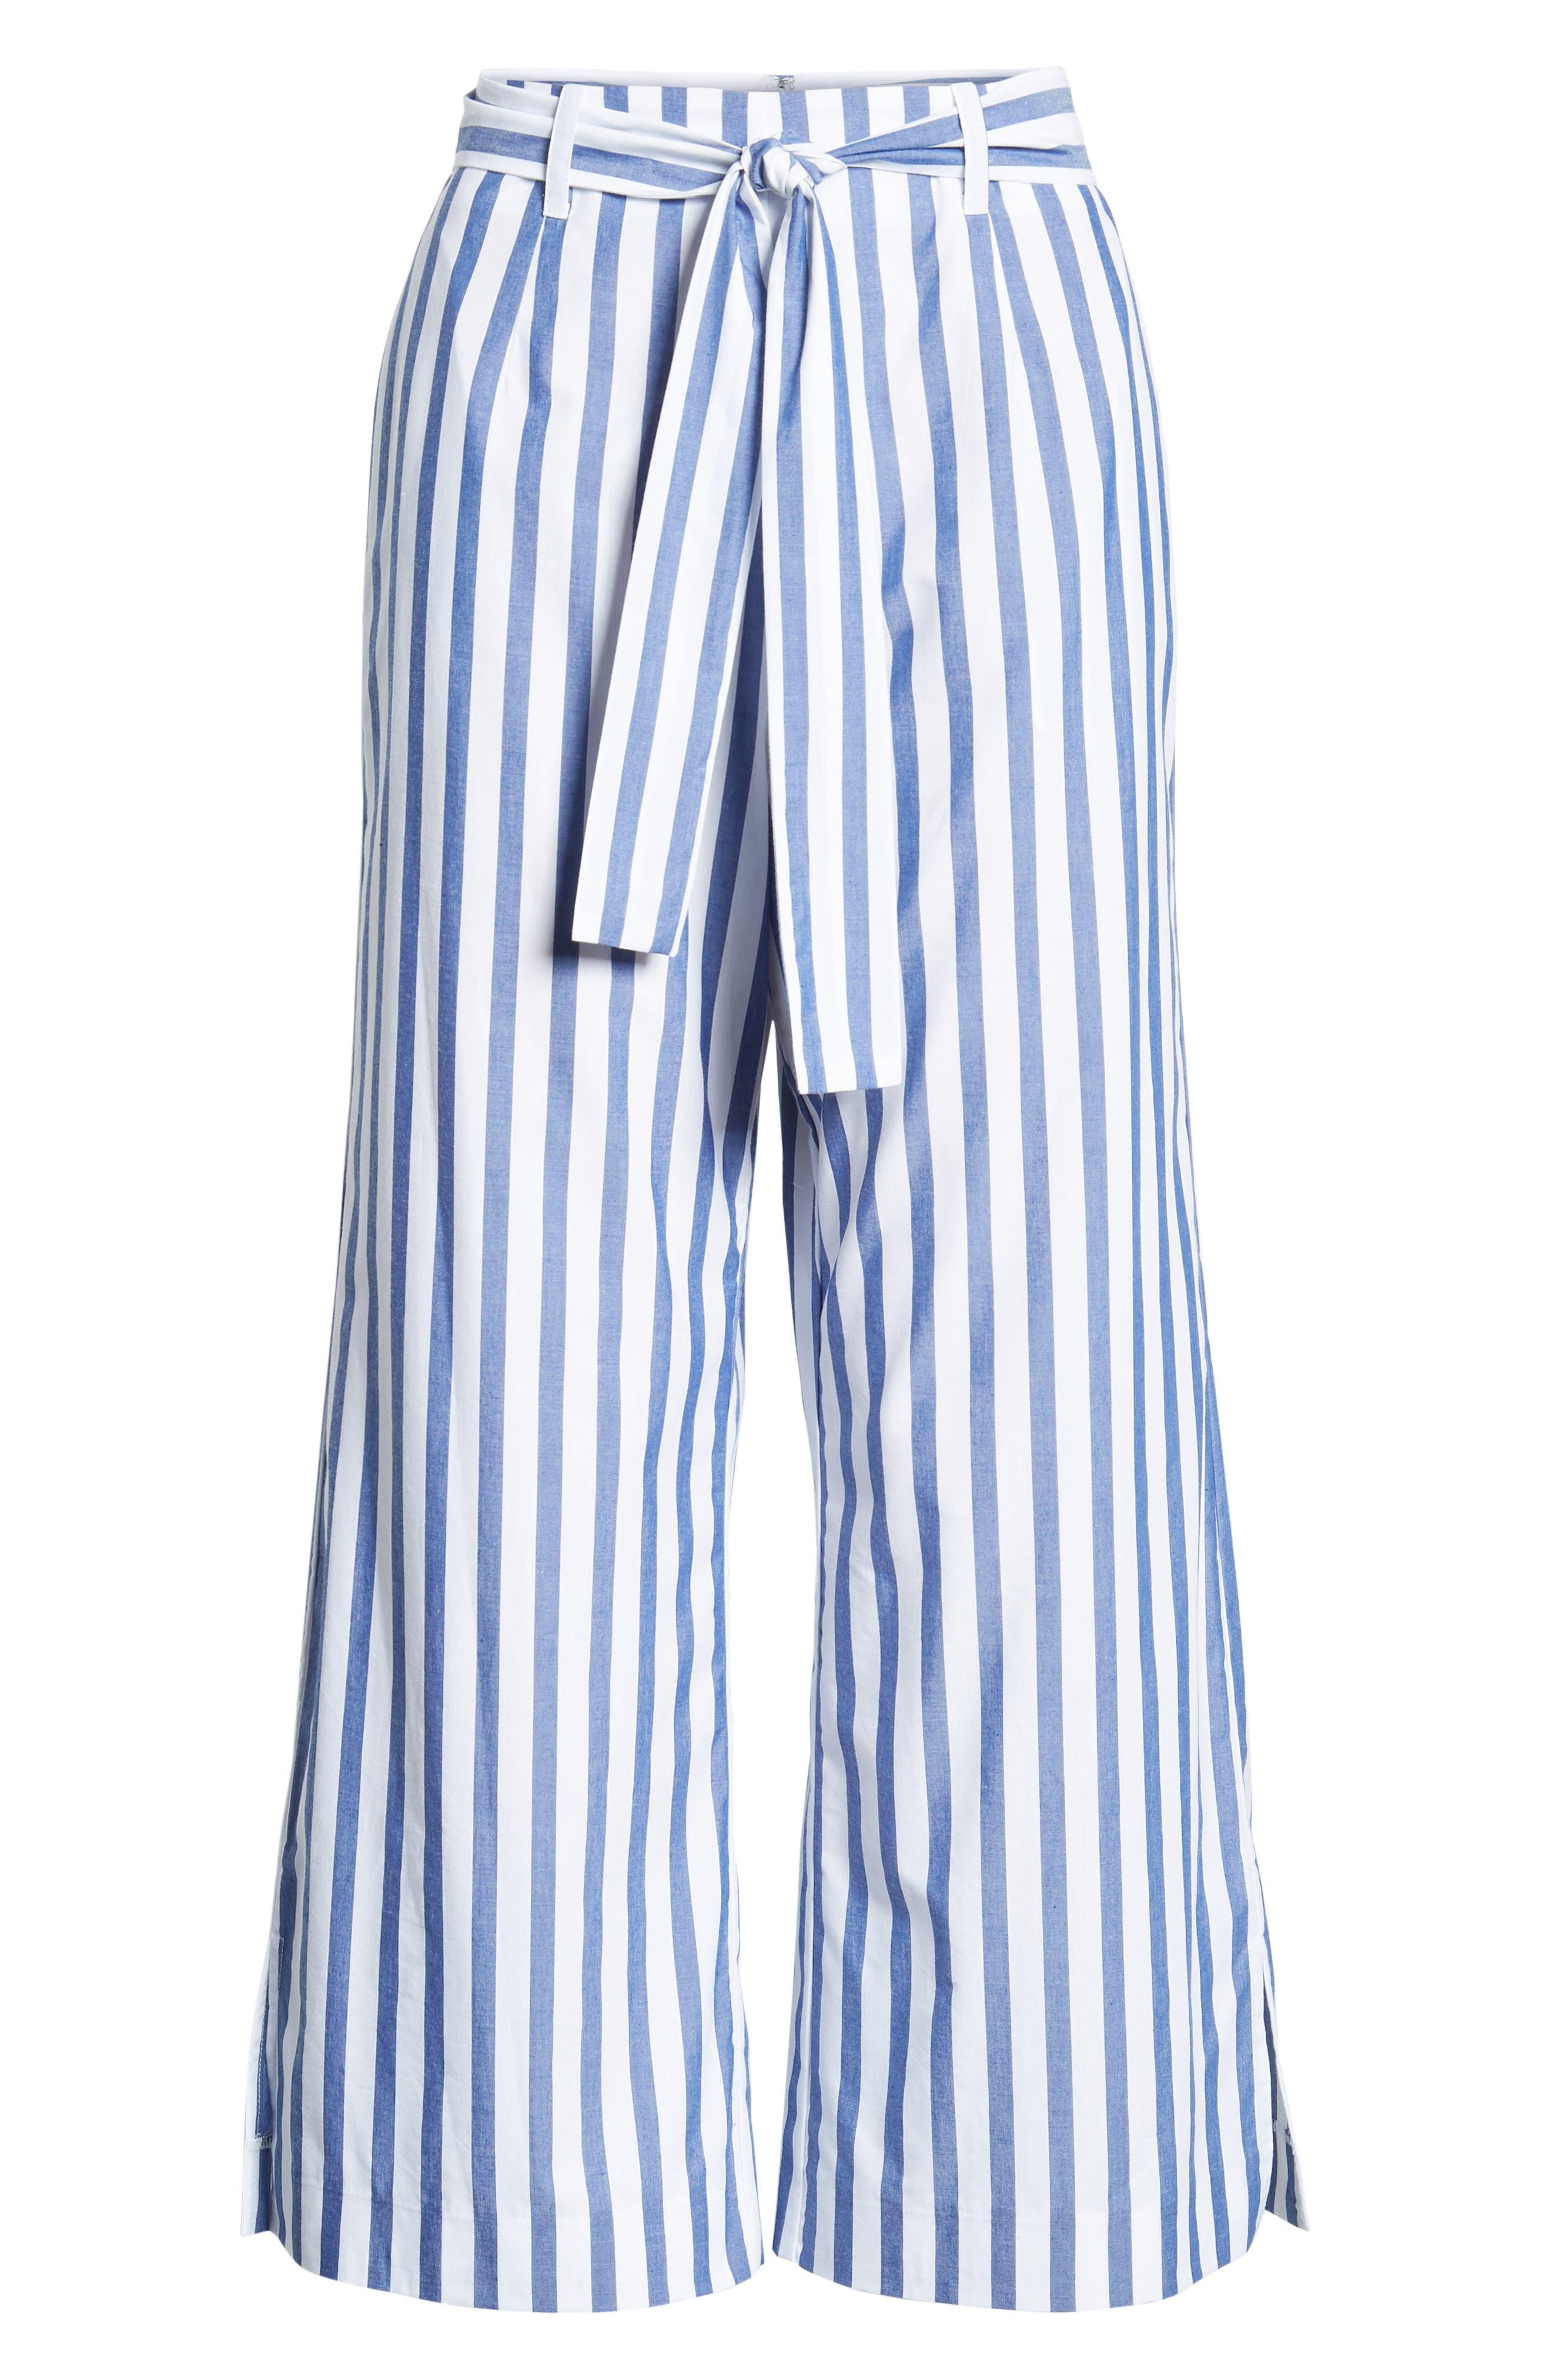 Aversa Crop Wide Leg Pants,                             Alternate thumbnail 6, color,                             009